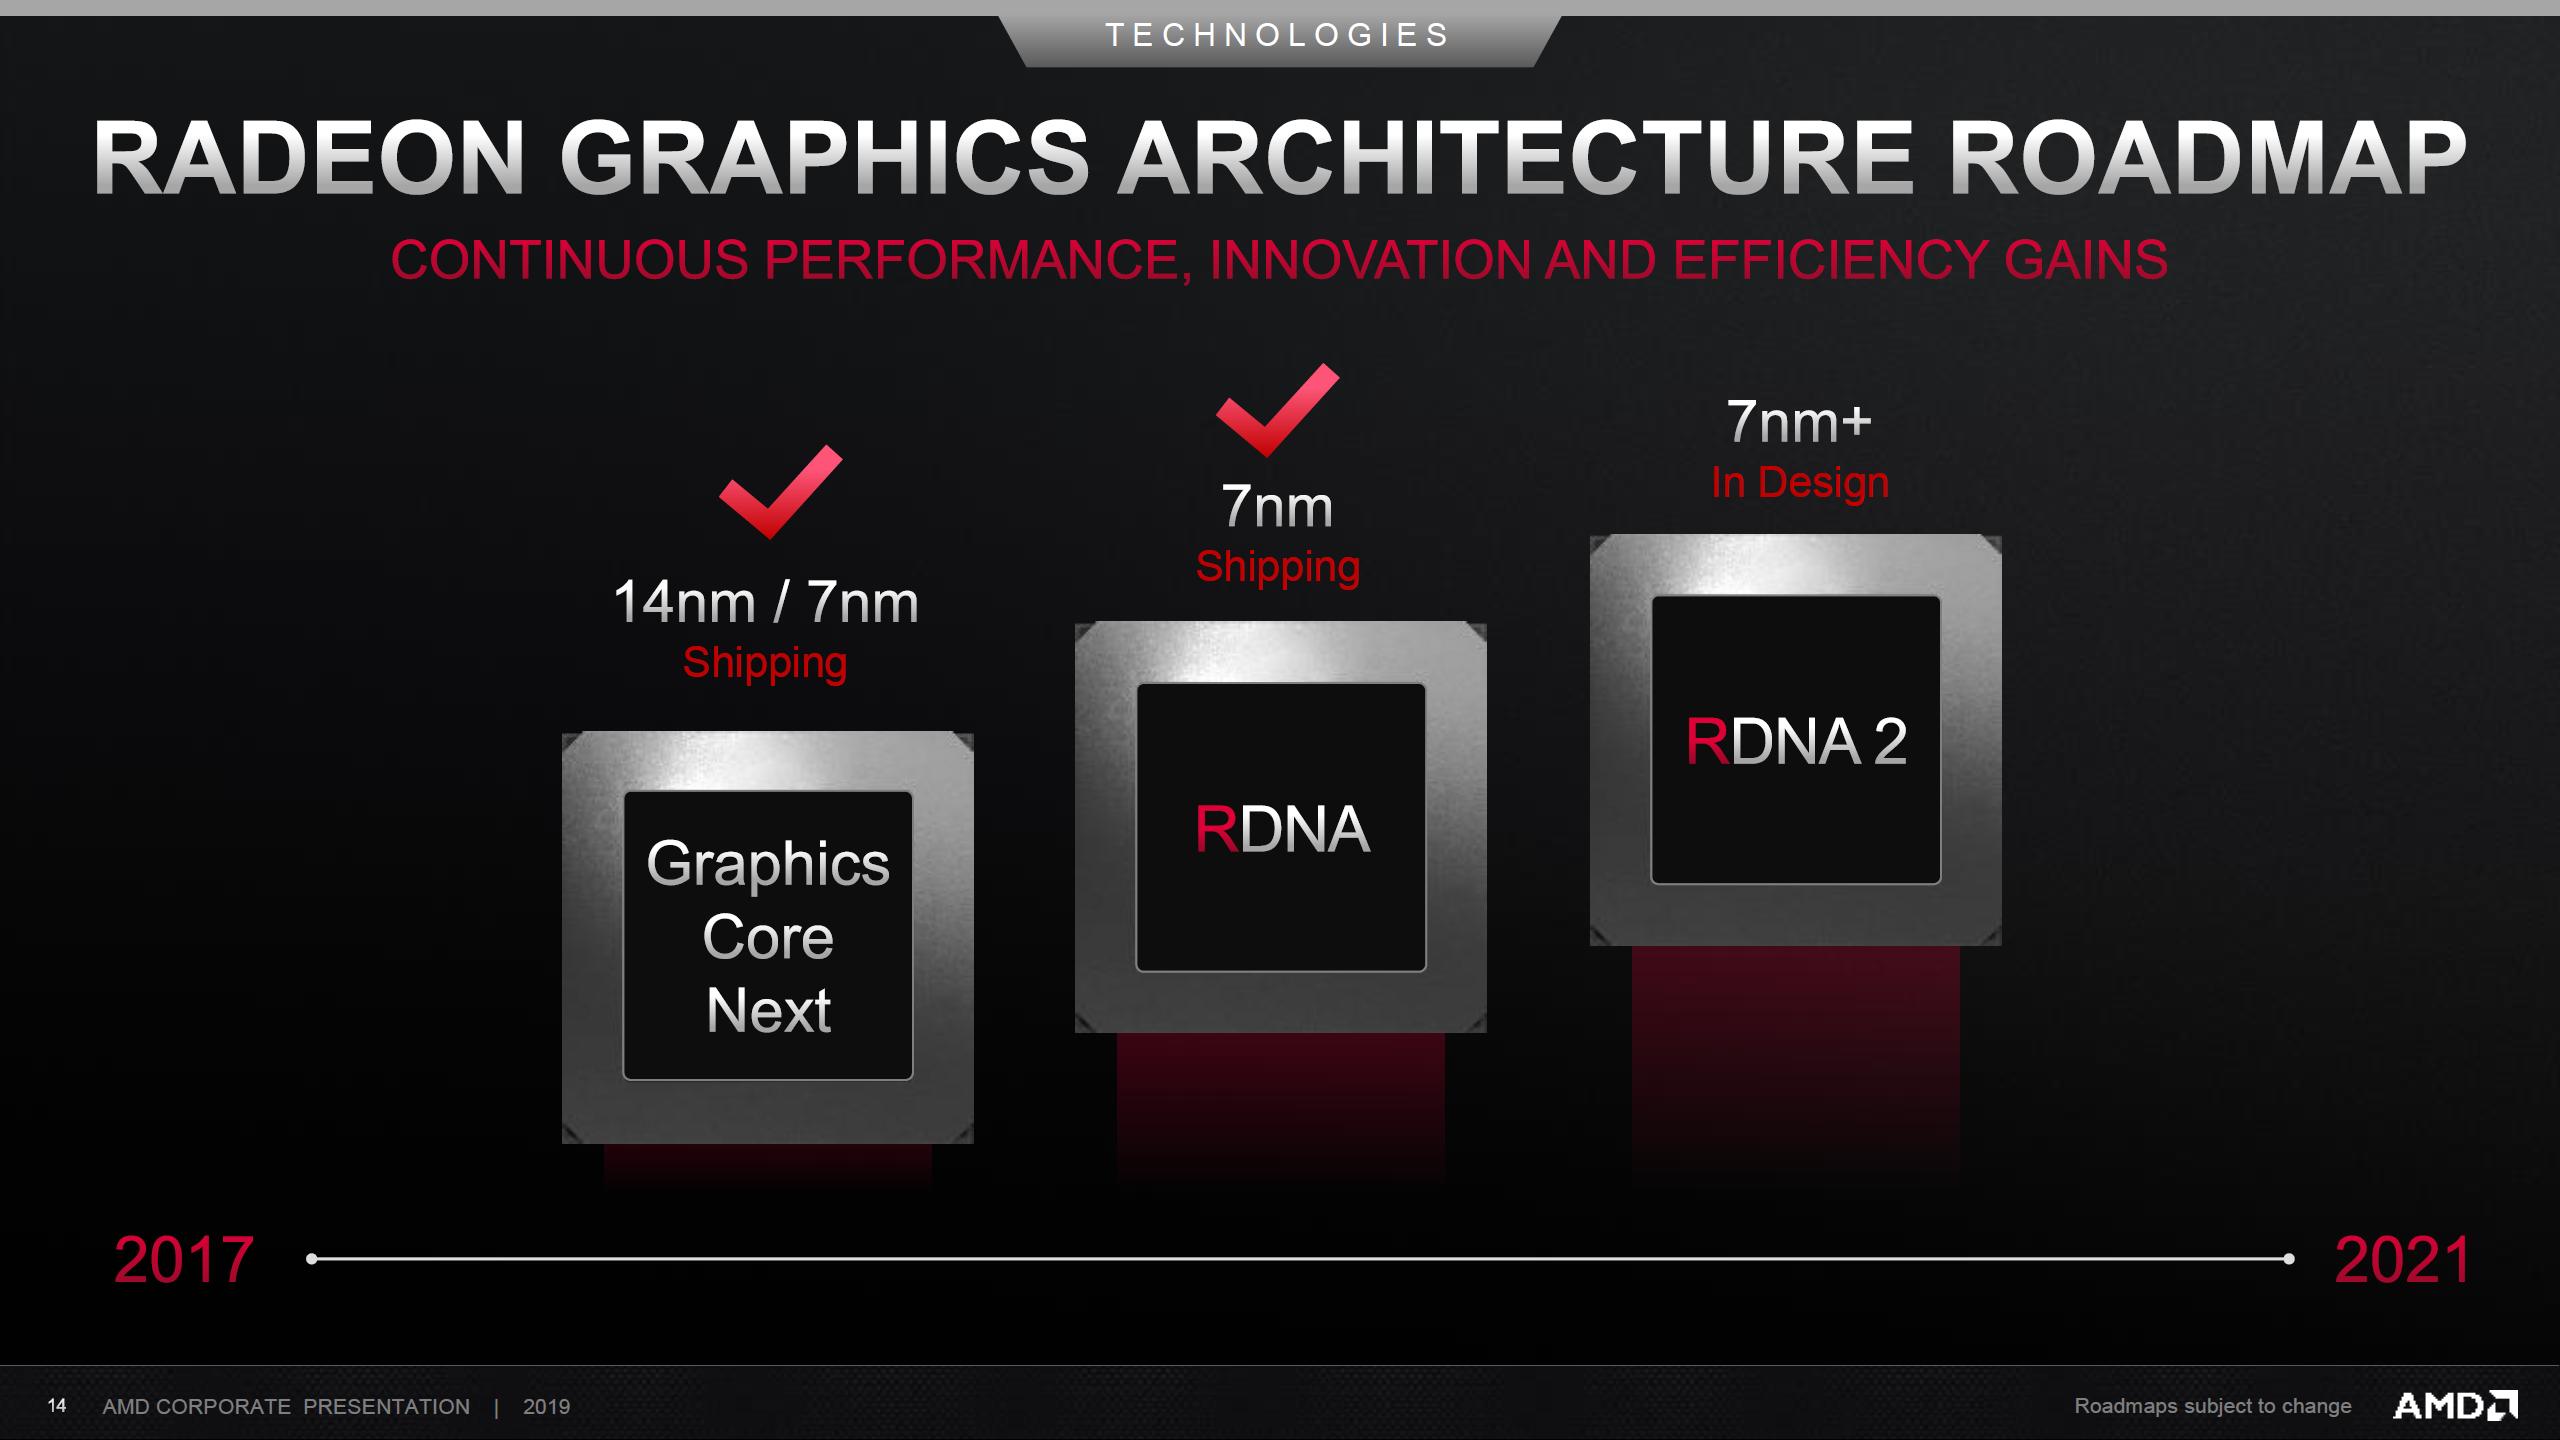 Amd 2nd Gen Rdna Based Radeon Rx Navi Gpus Arrive At Ces 2020